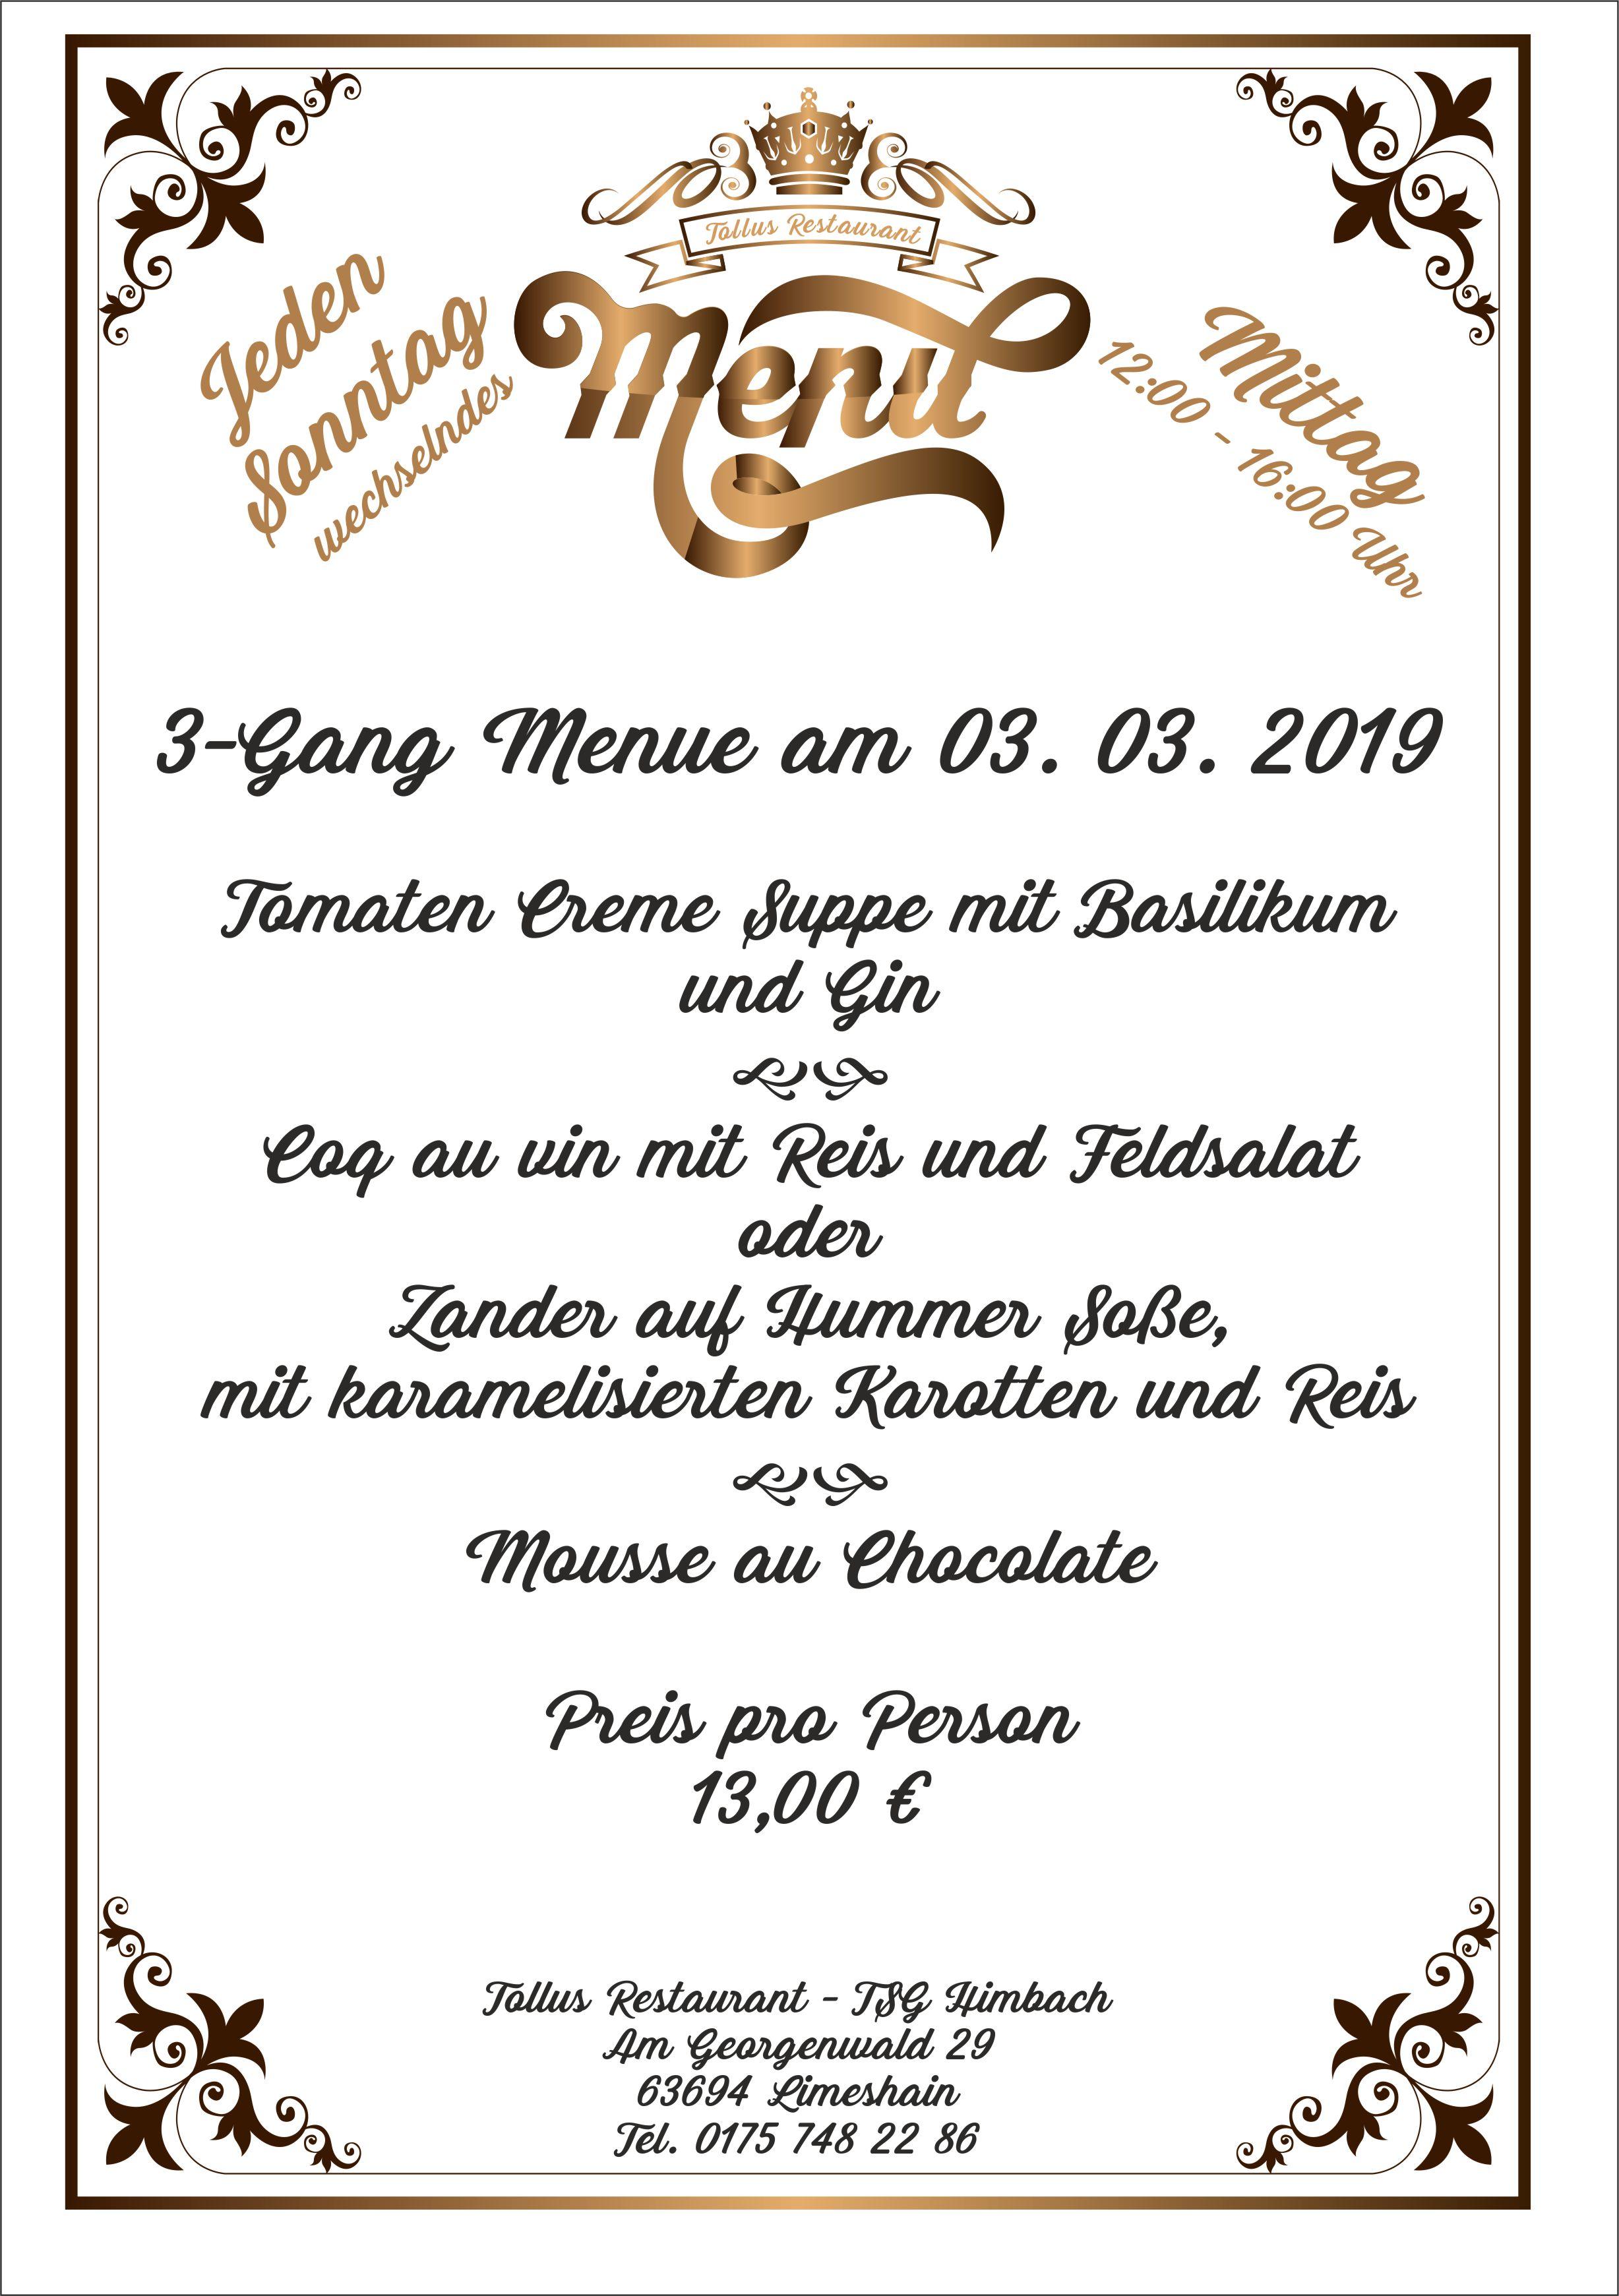 Sonntags Mittags Menue 03. 03. 2019